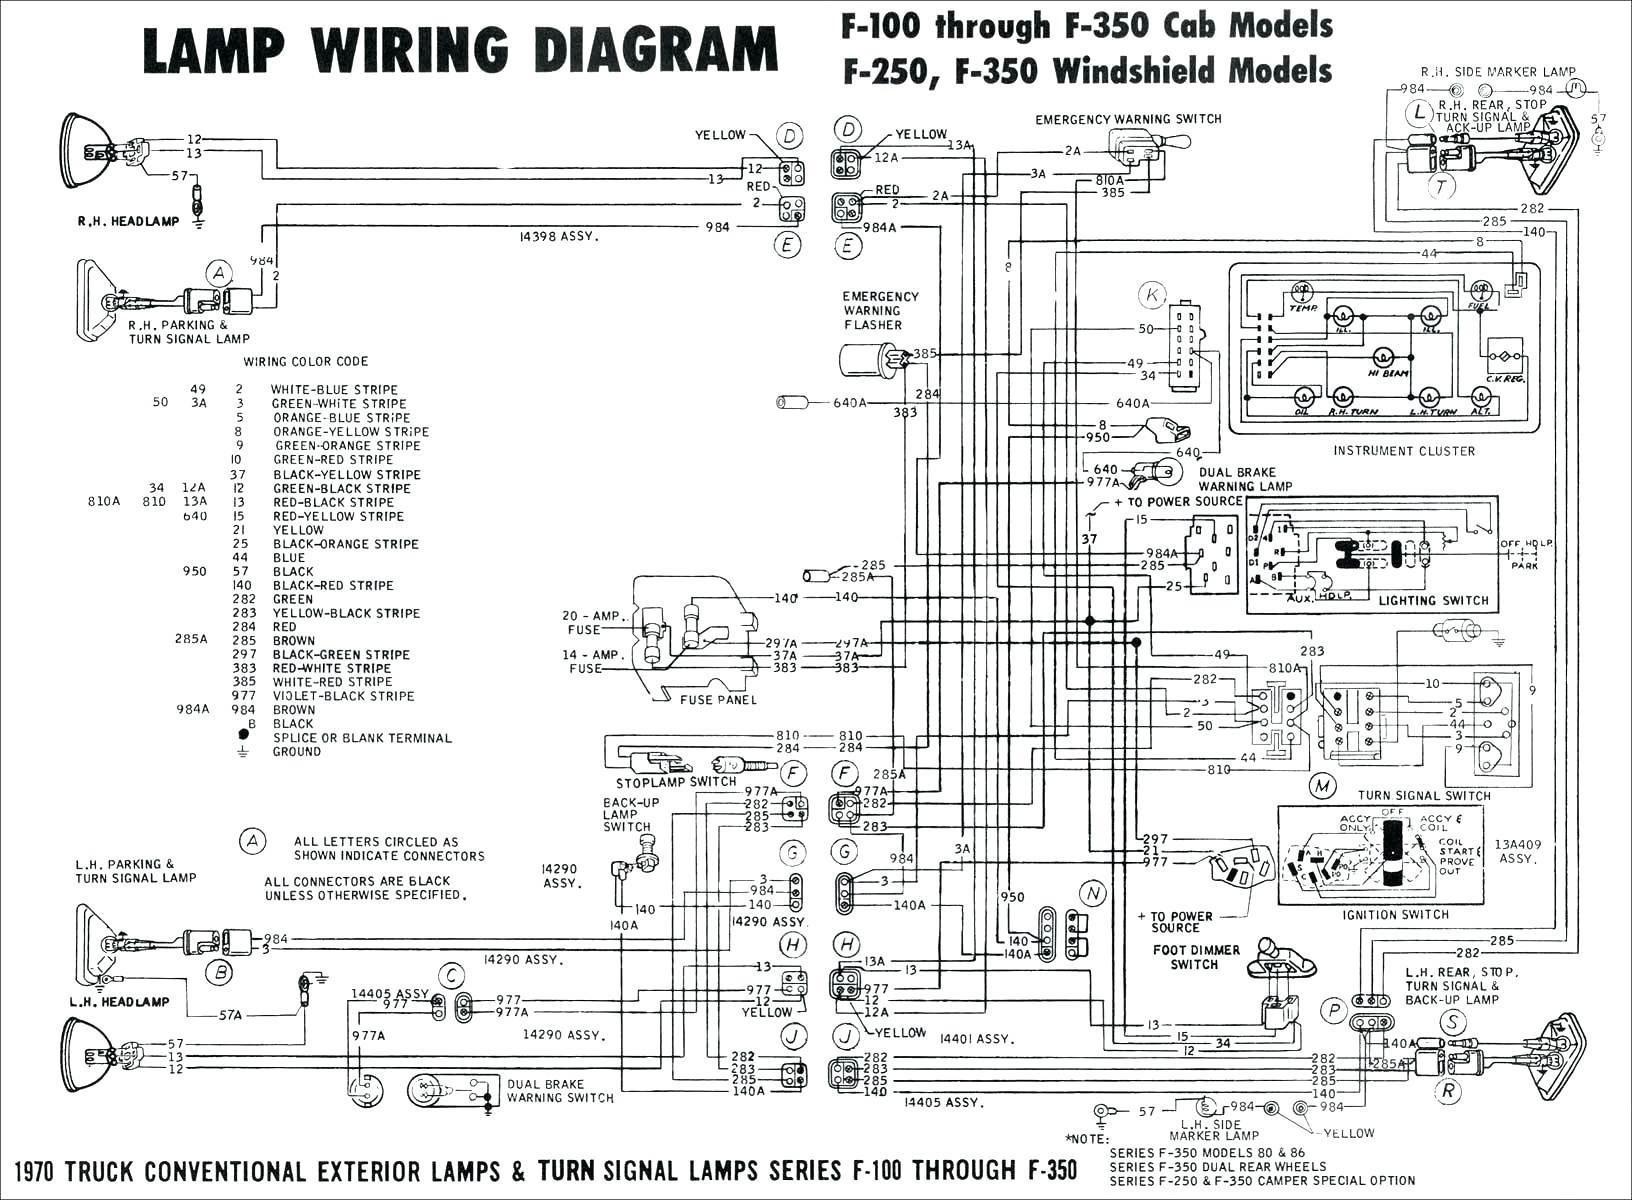 6 20R Receptacle Wiring Diagram | Wiring Diagram - Nema 6-20R Wiring Diagram